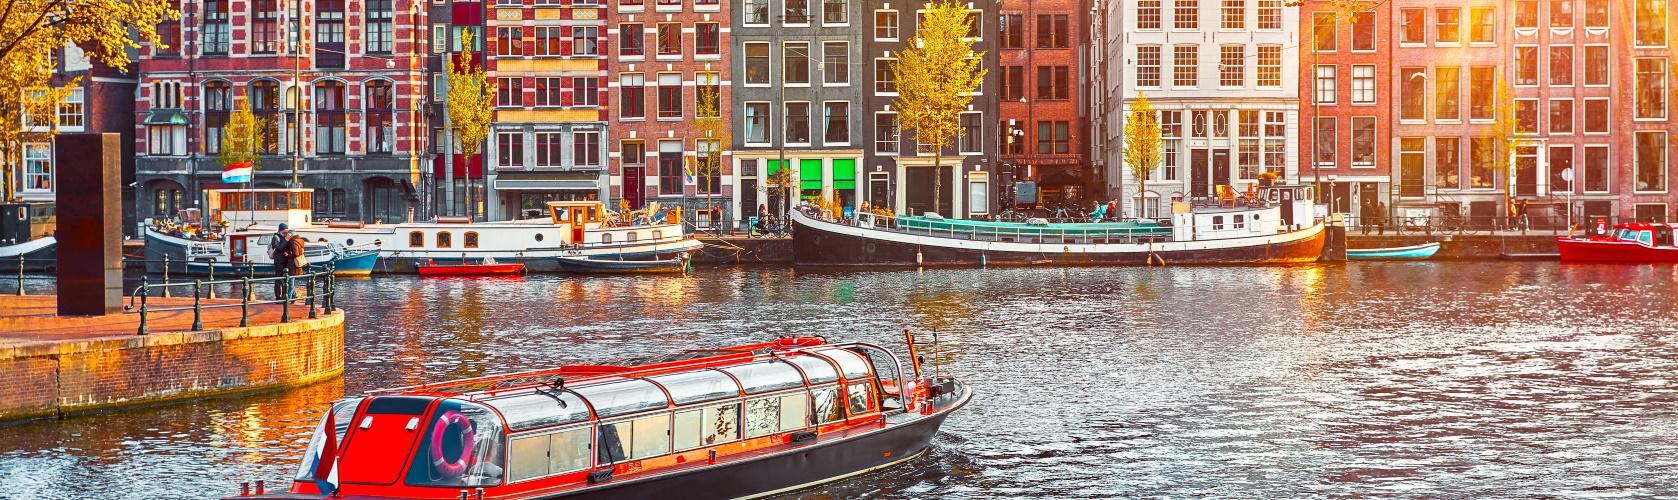 EyeforTravel-Revenue Optimisation in Amsterdam